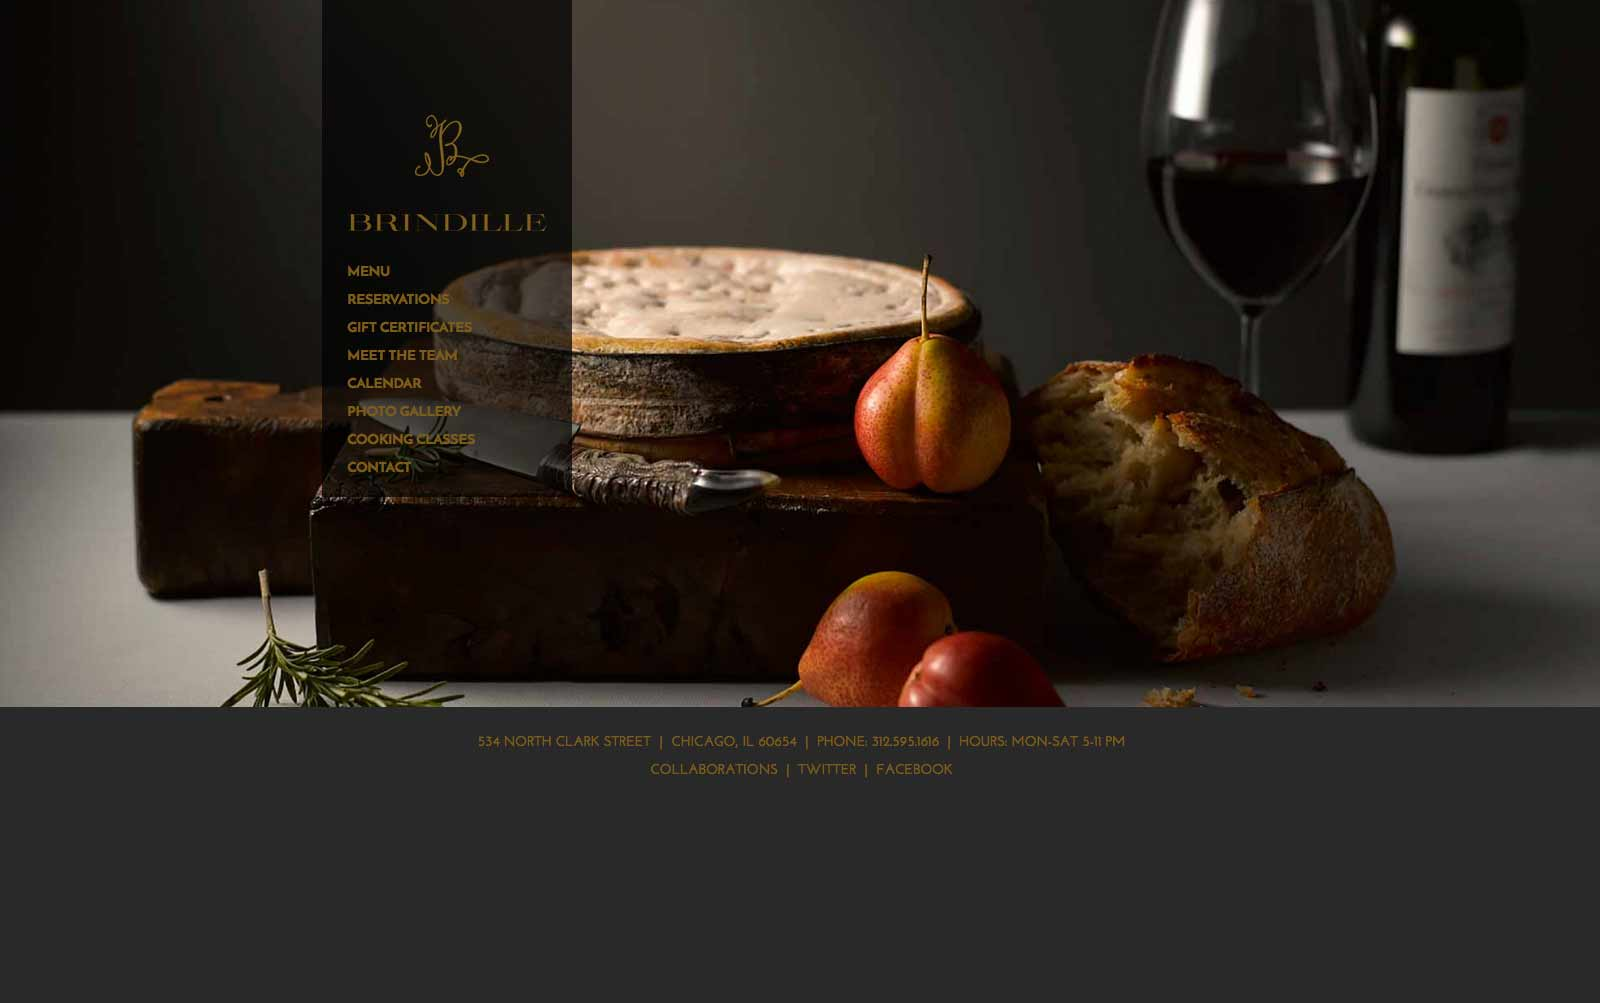 Brindille-chicago.com brindille - home